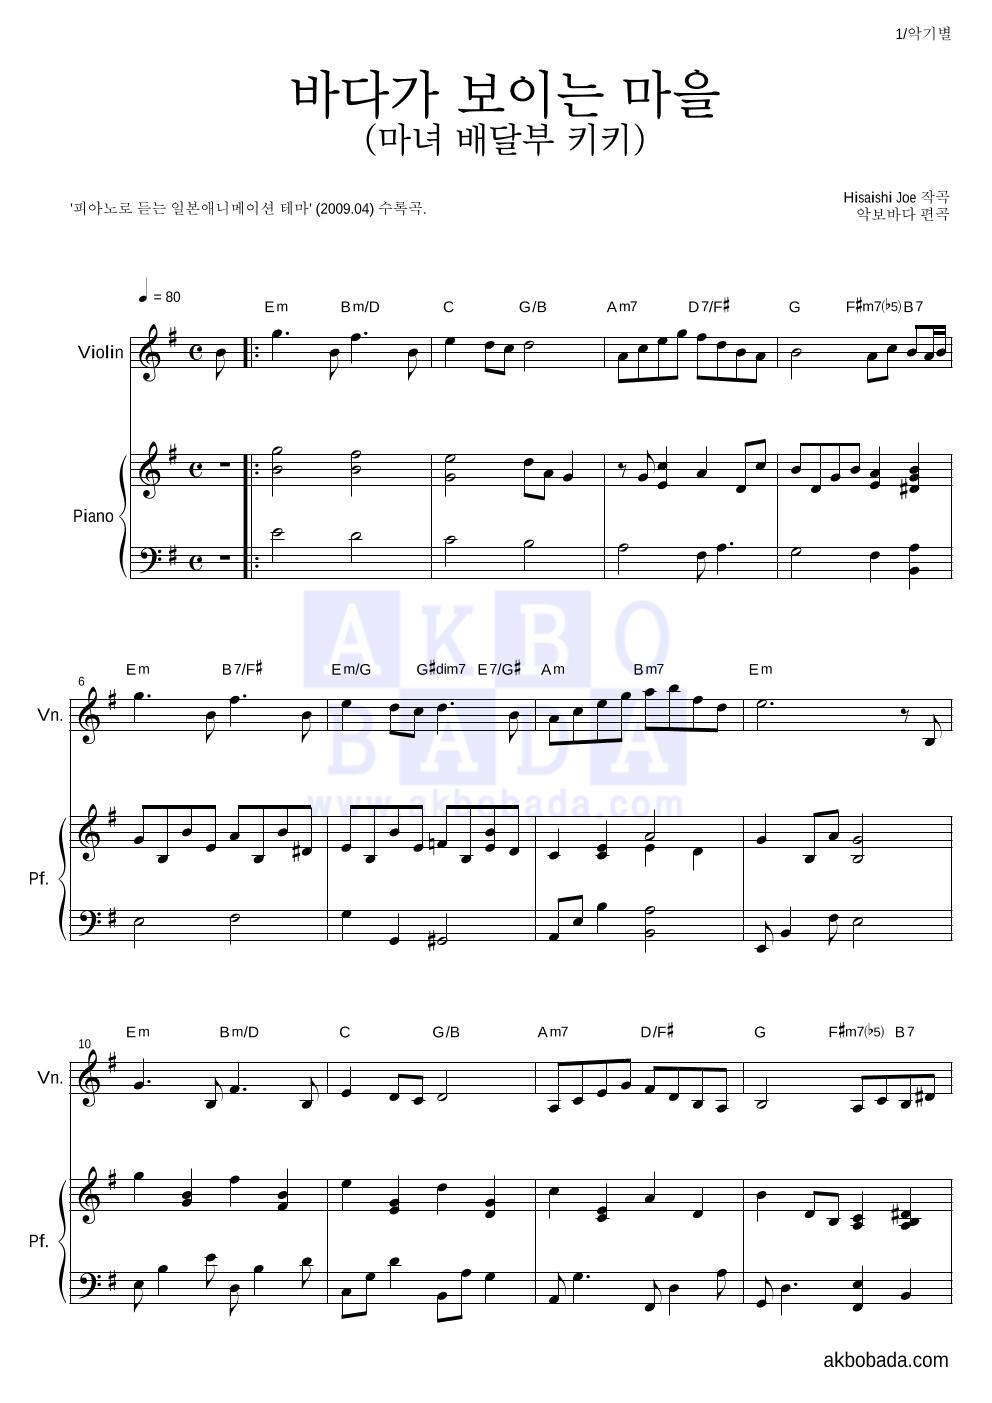 Hisaishi Joe - 海の見える街 / 바다가 보이는 마을 (마녀 배달부 키키) 바이올린&피아노 악보